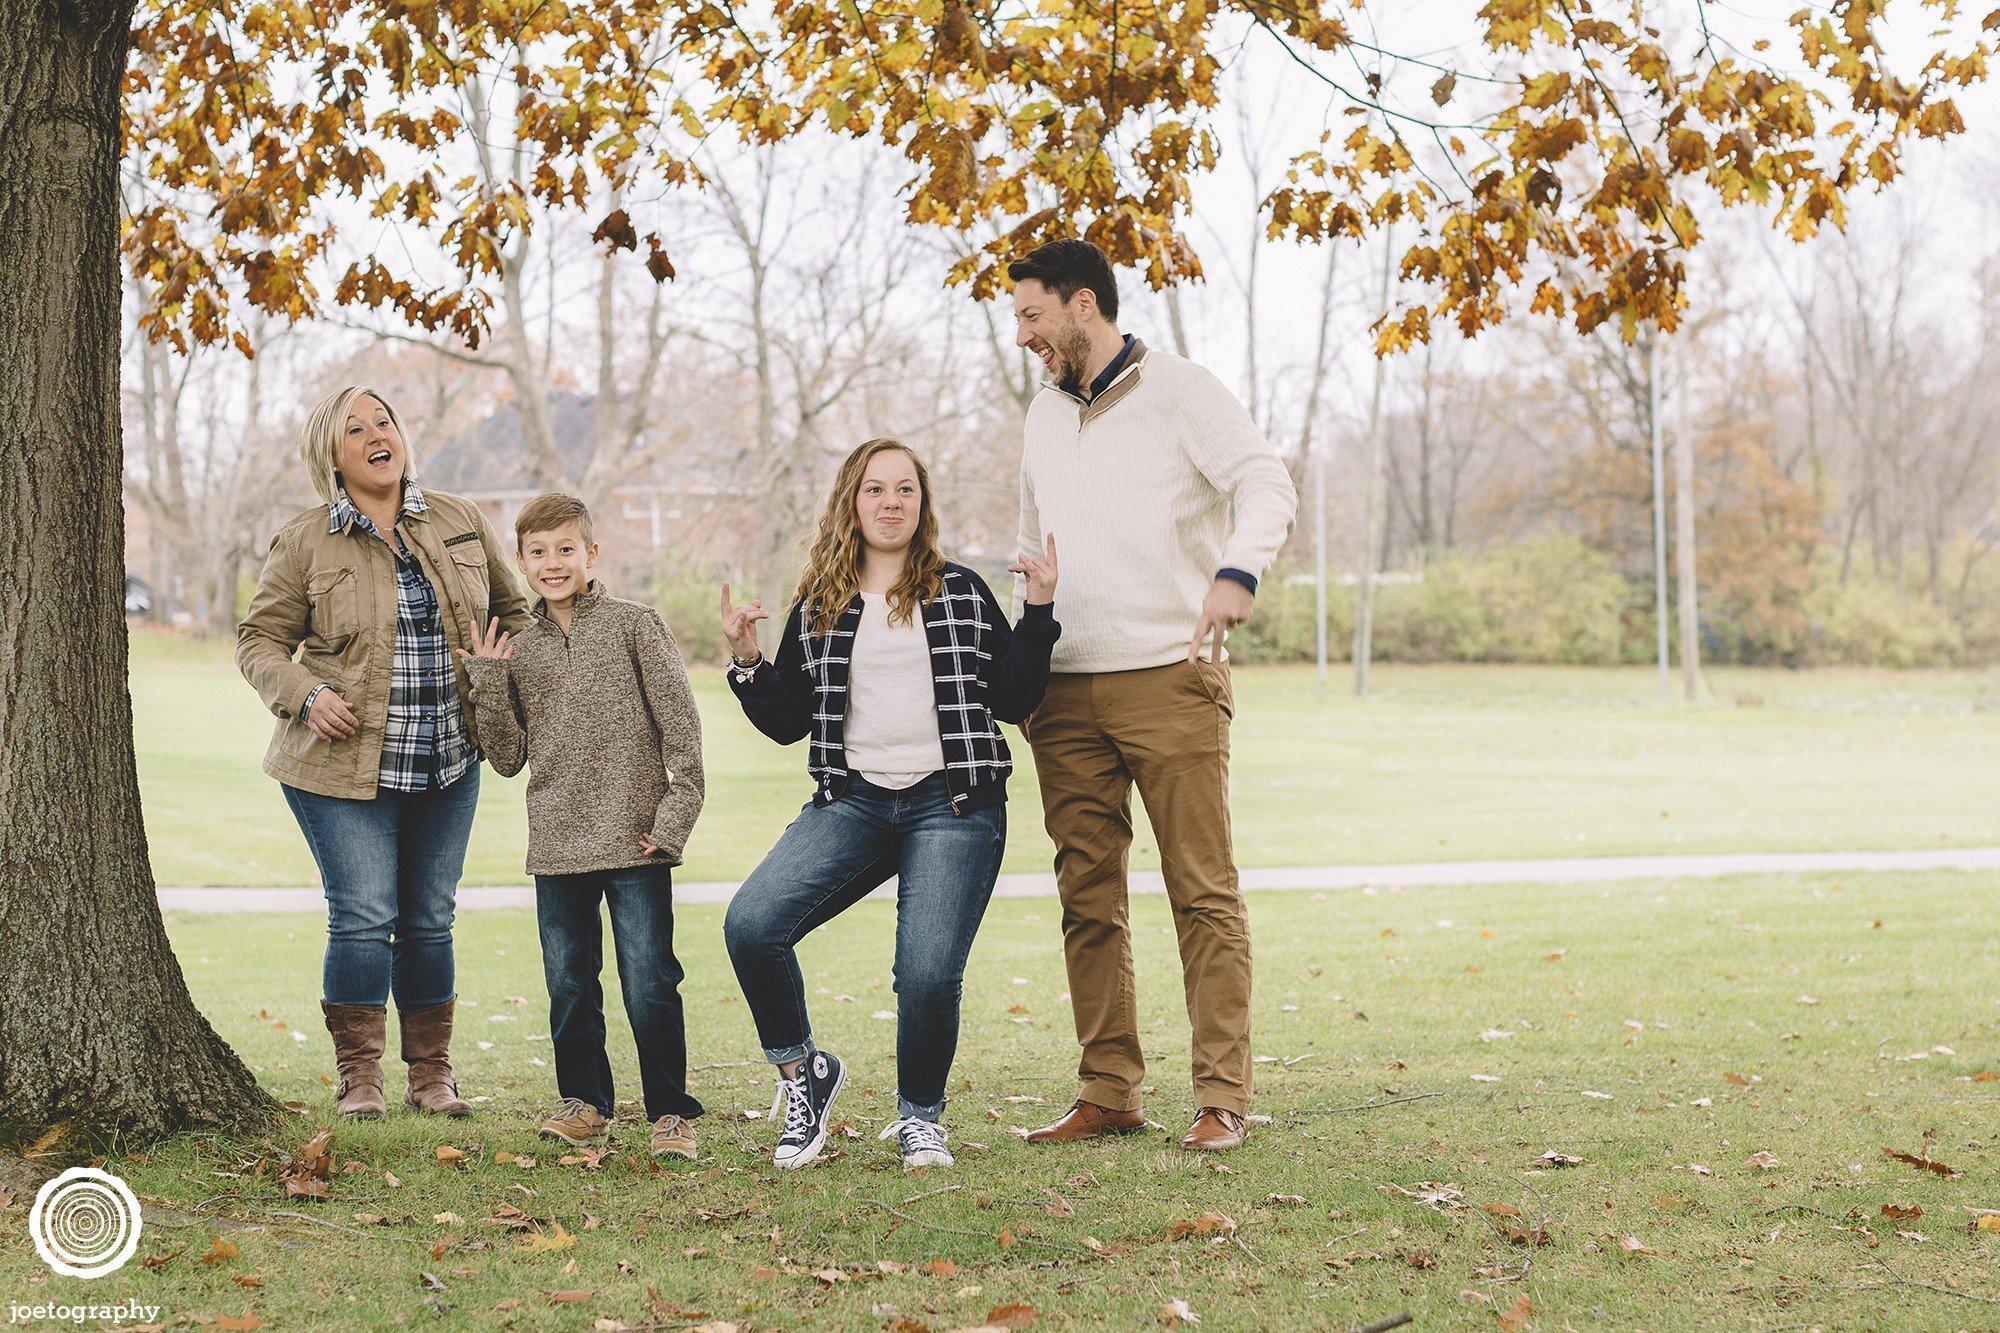 Teeple Family Photographs   Indianapolis - 2